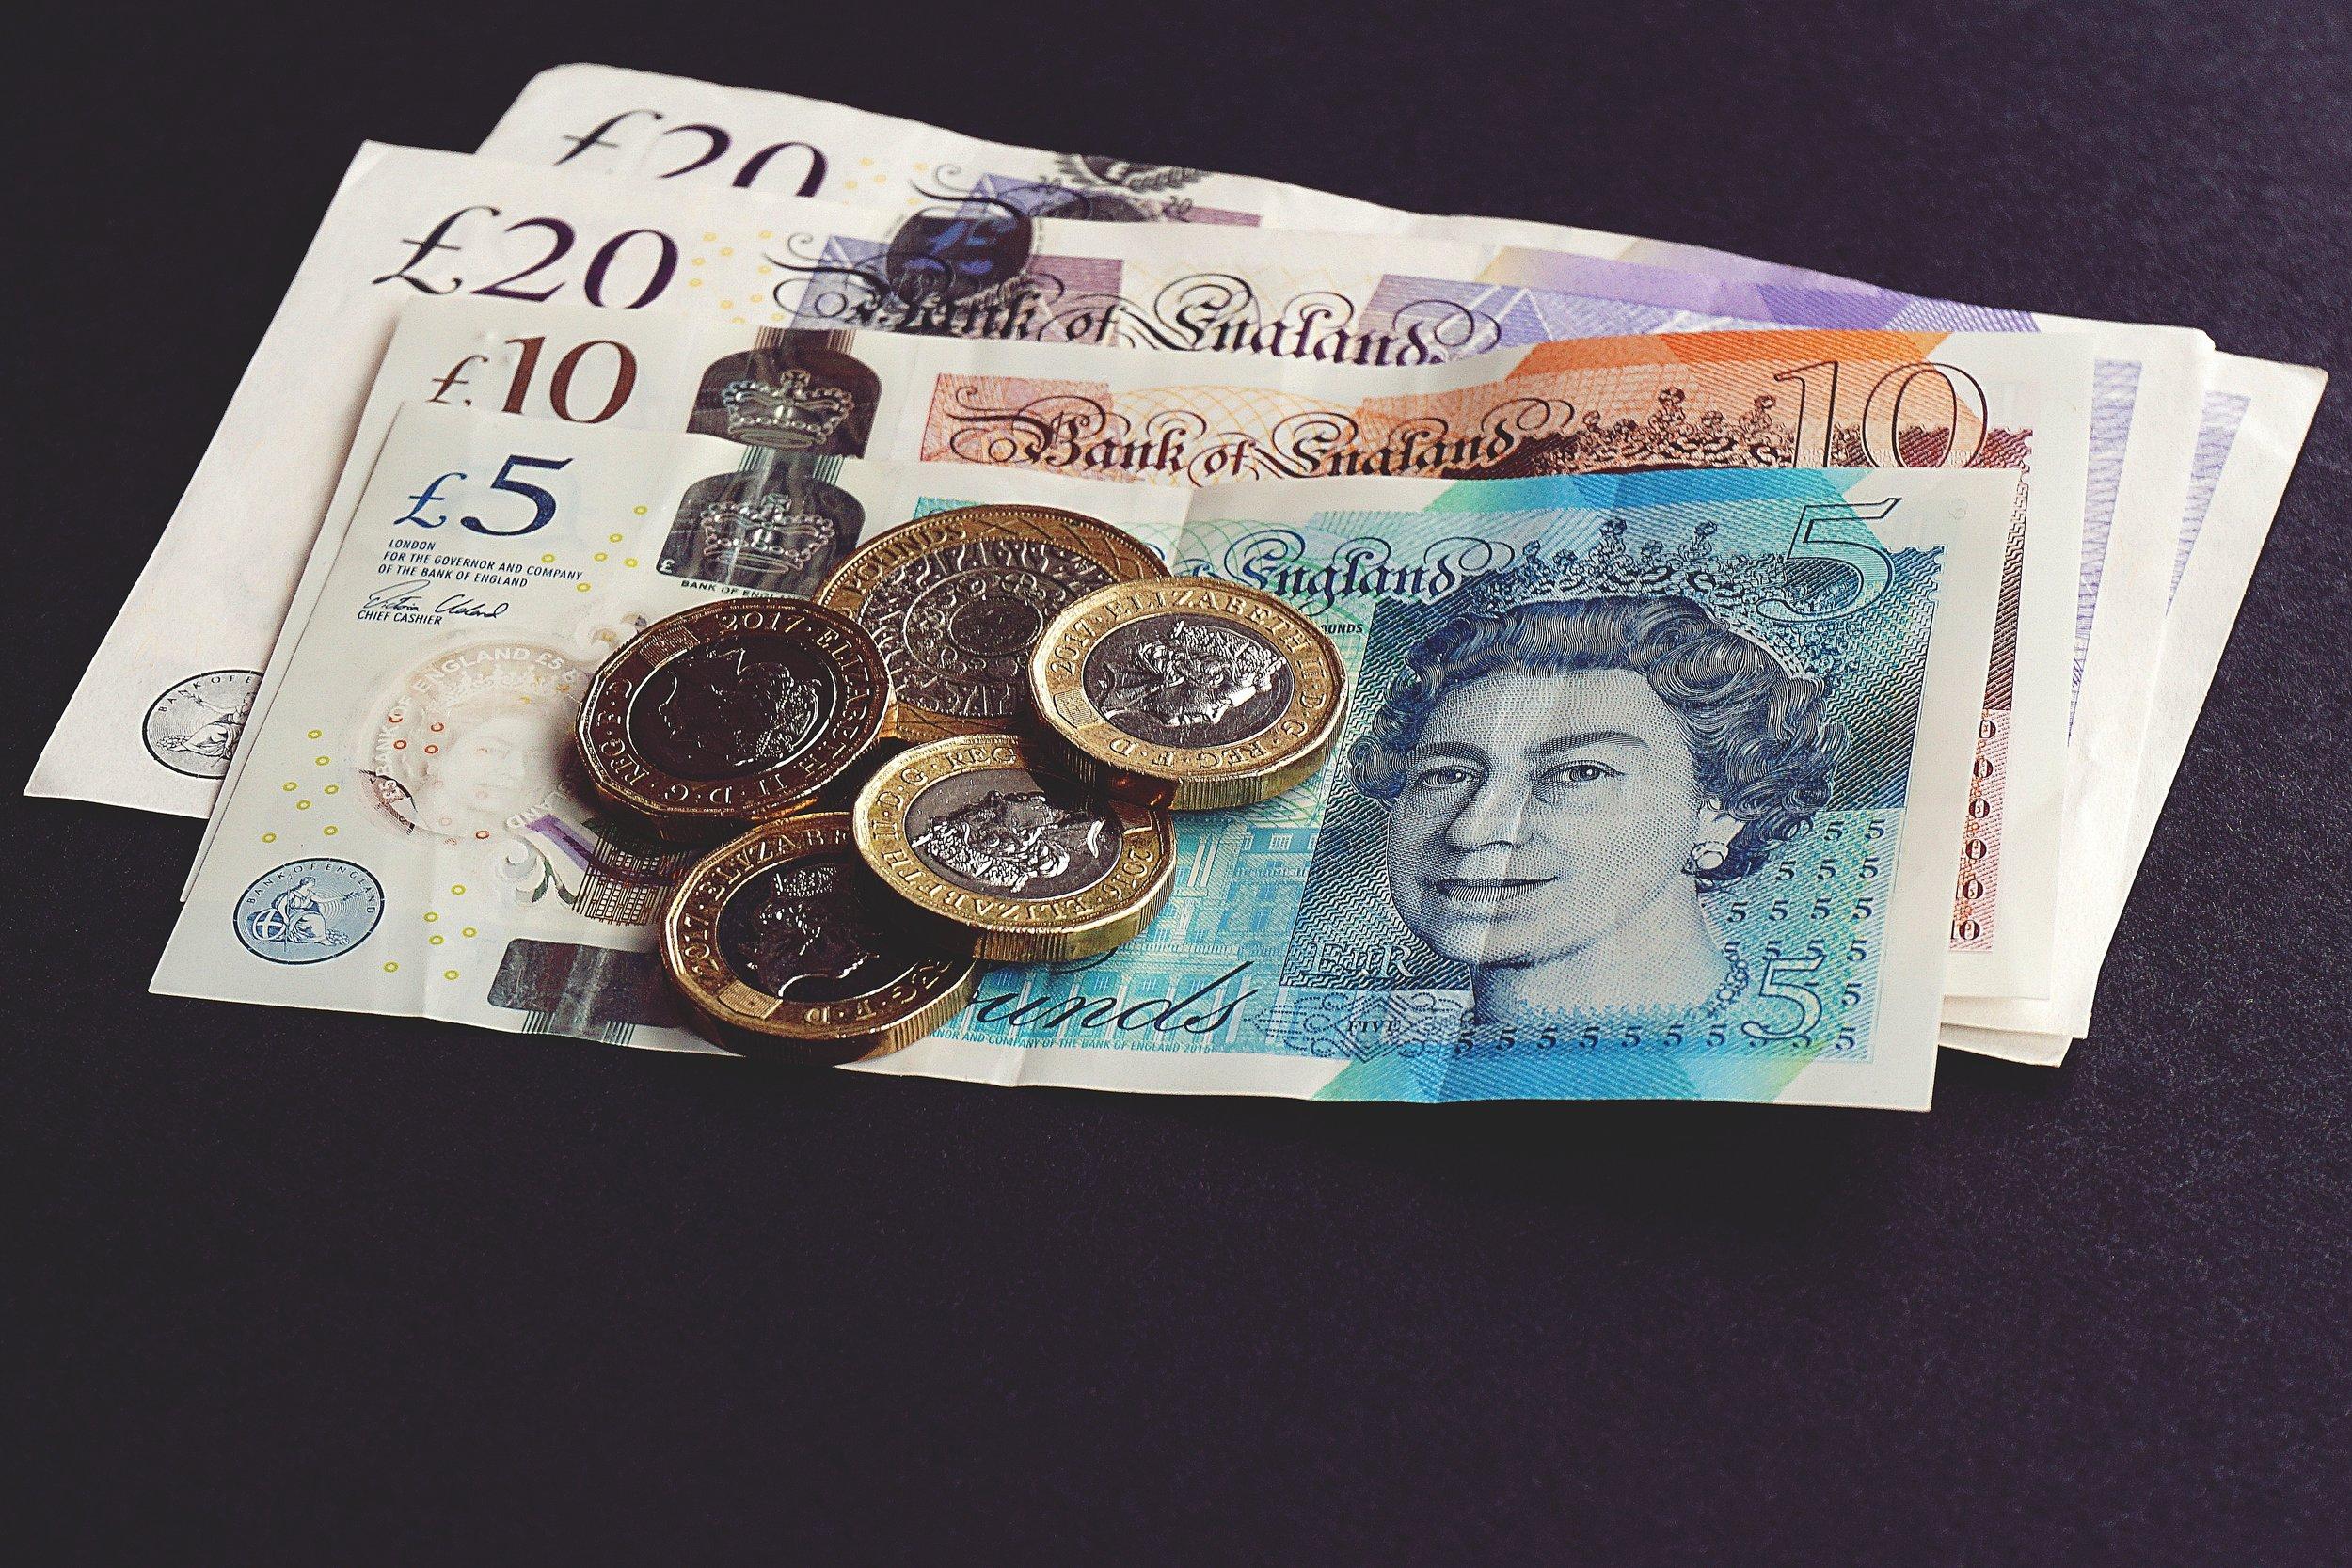 bank-notes-cash-coins-1791583.jpg